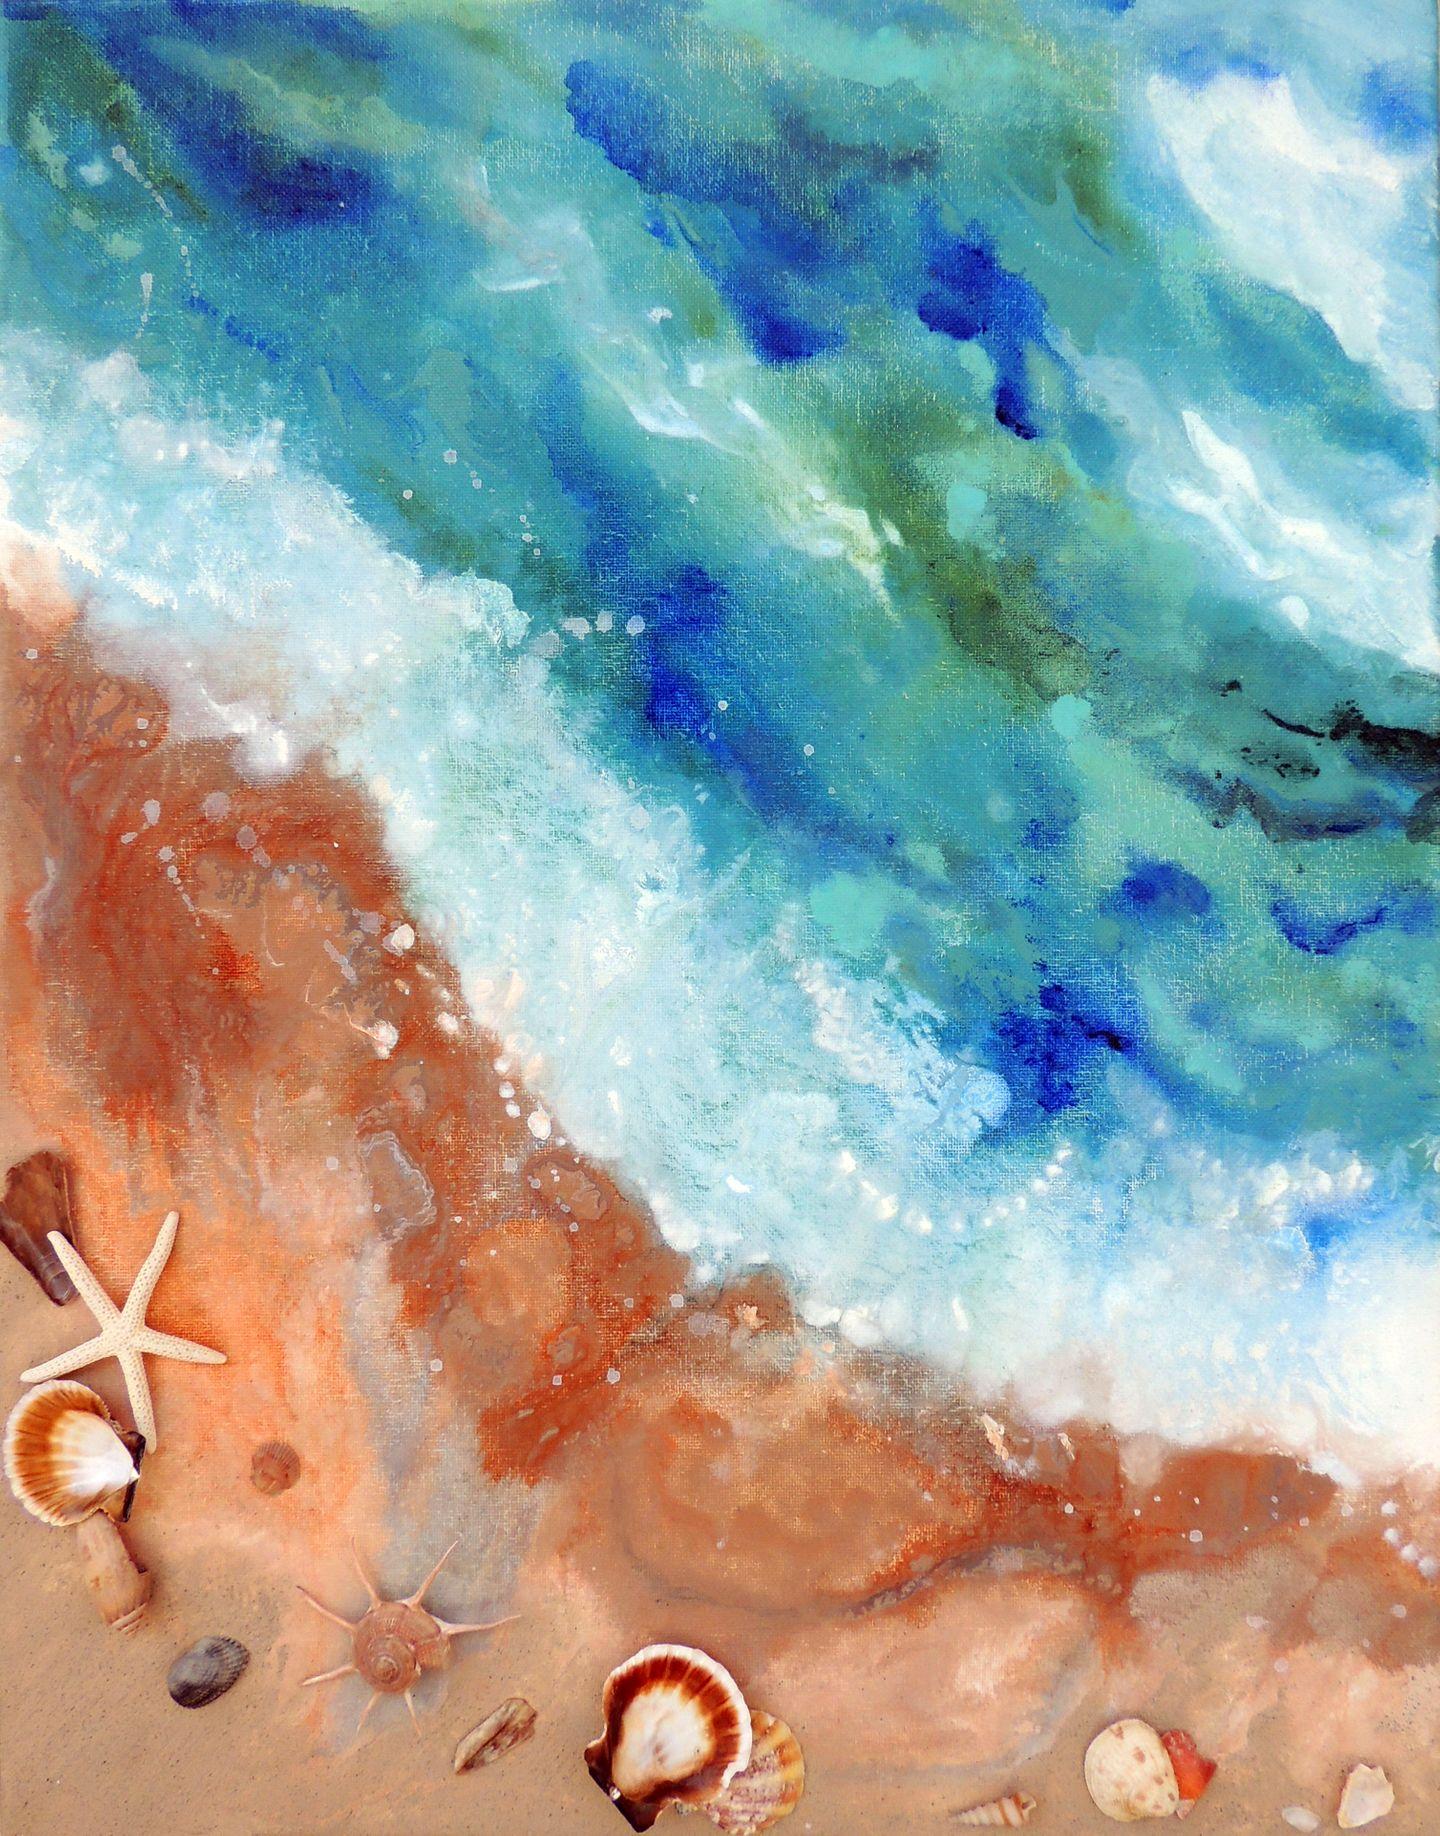 Seashore-w-Shells.jpg